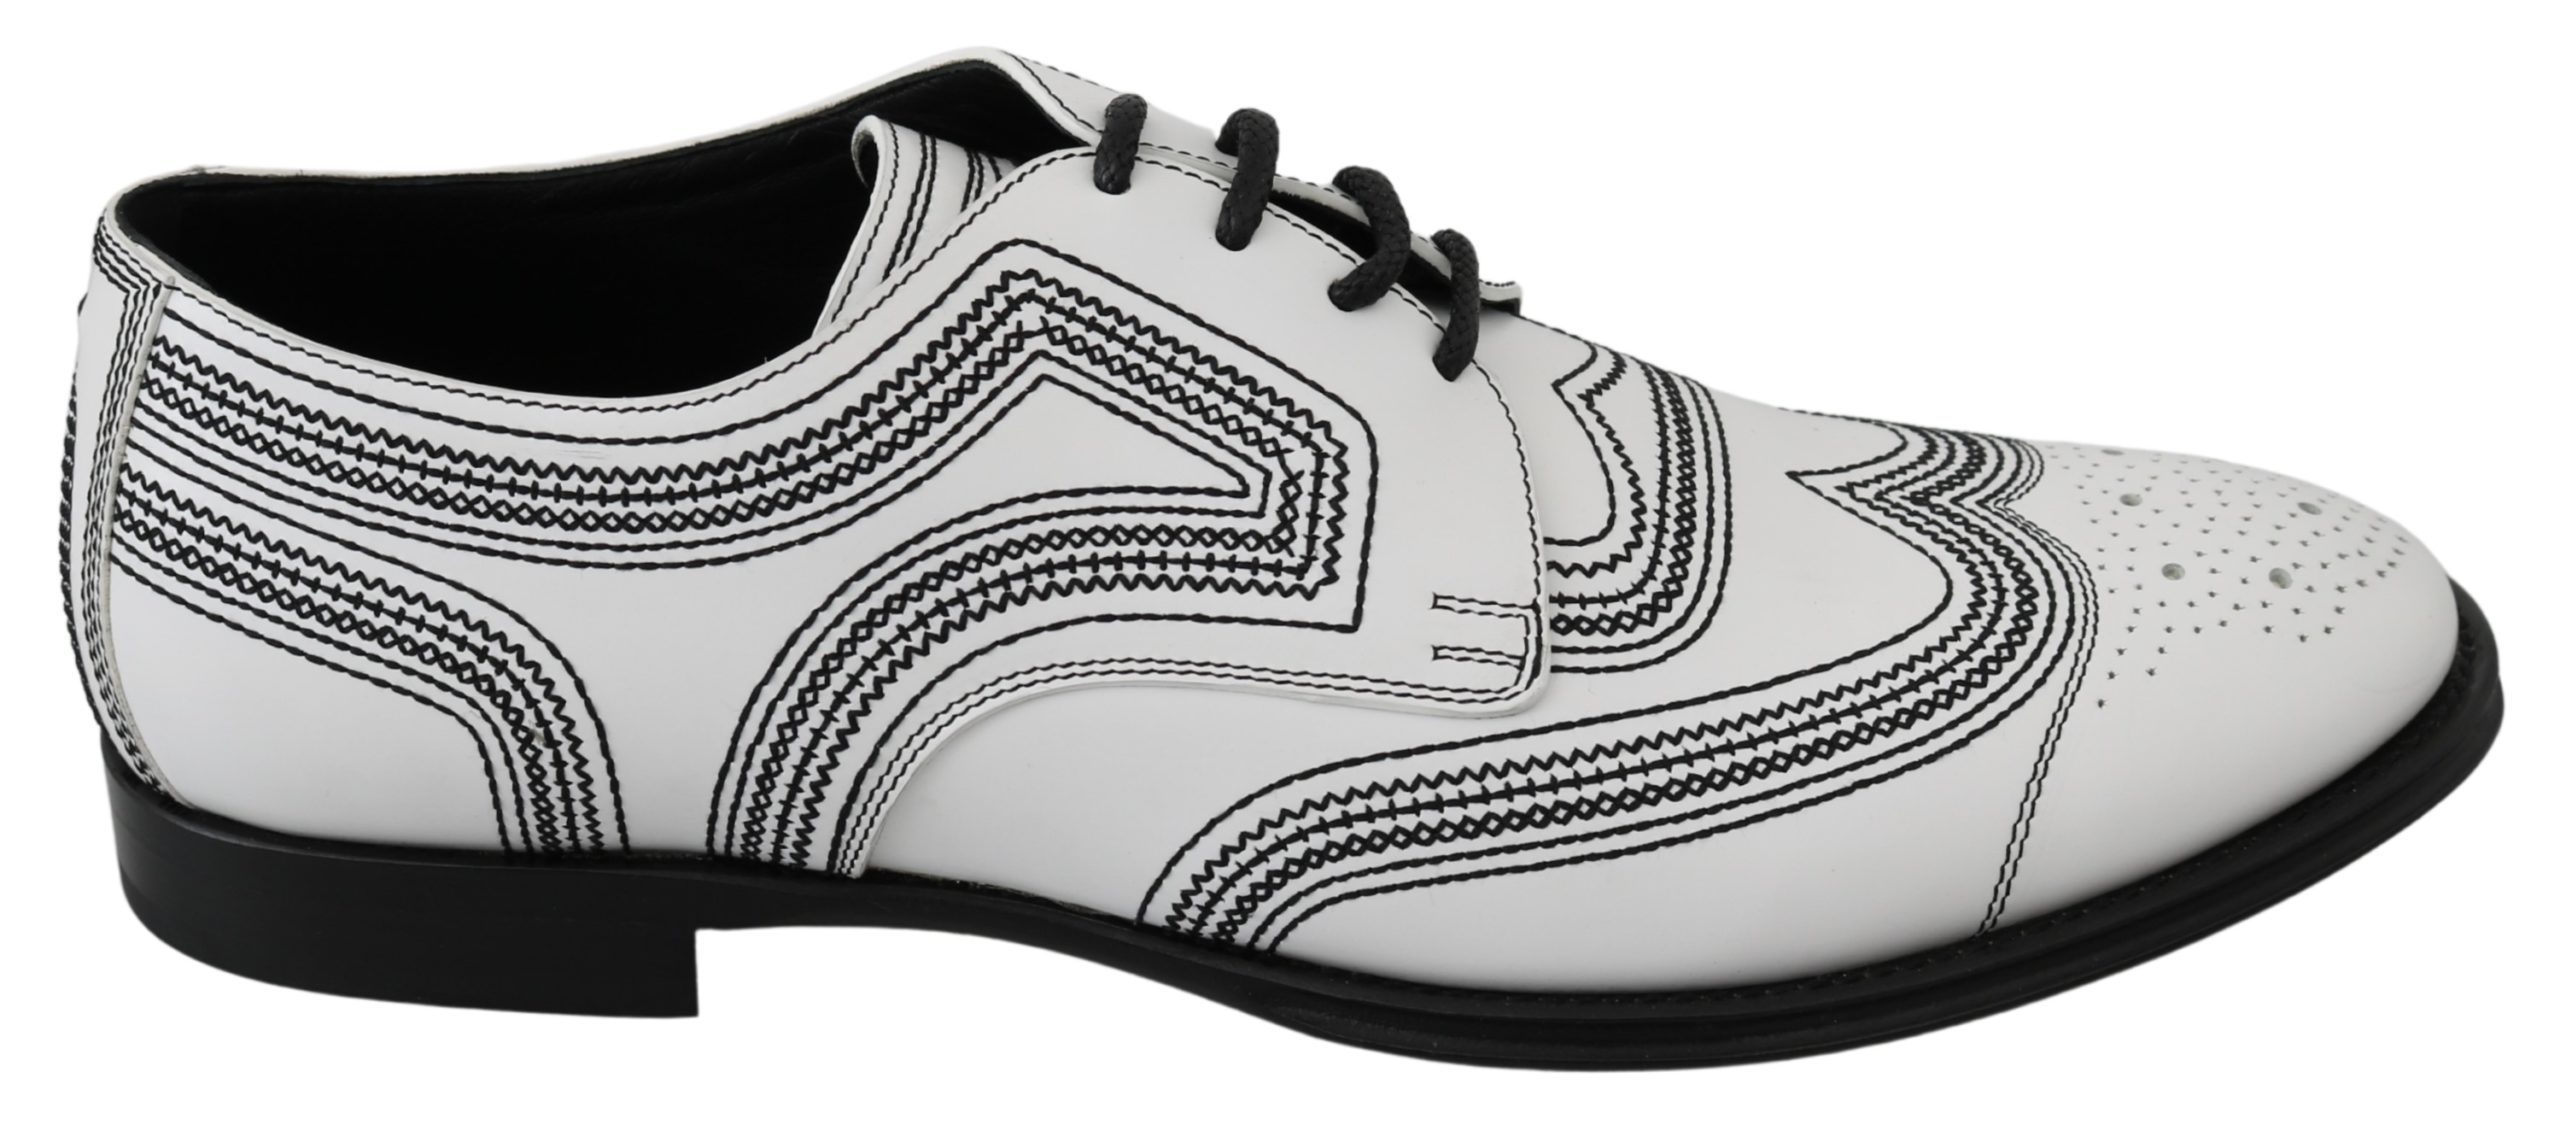 Dolce & Gabbana Men's Leather Formal Derby Shoe White MV3046 - EU44/US11